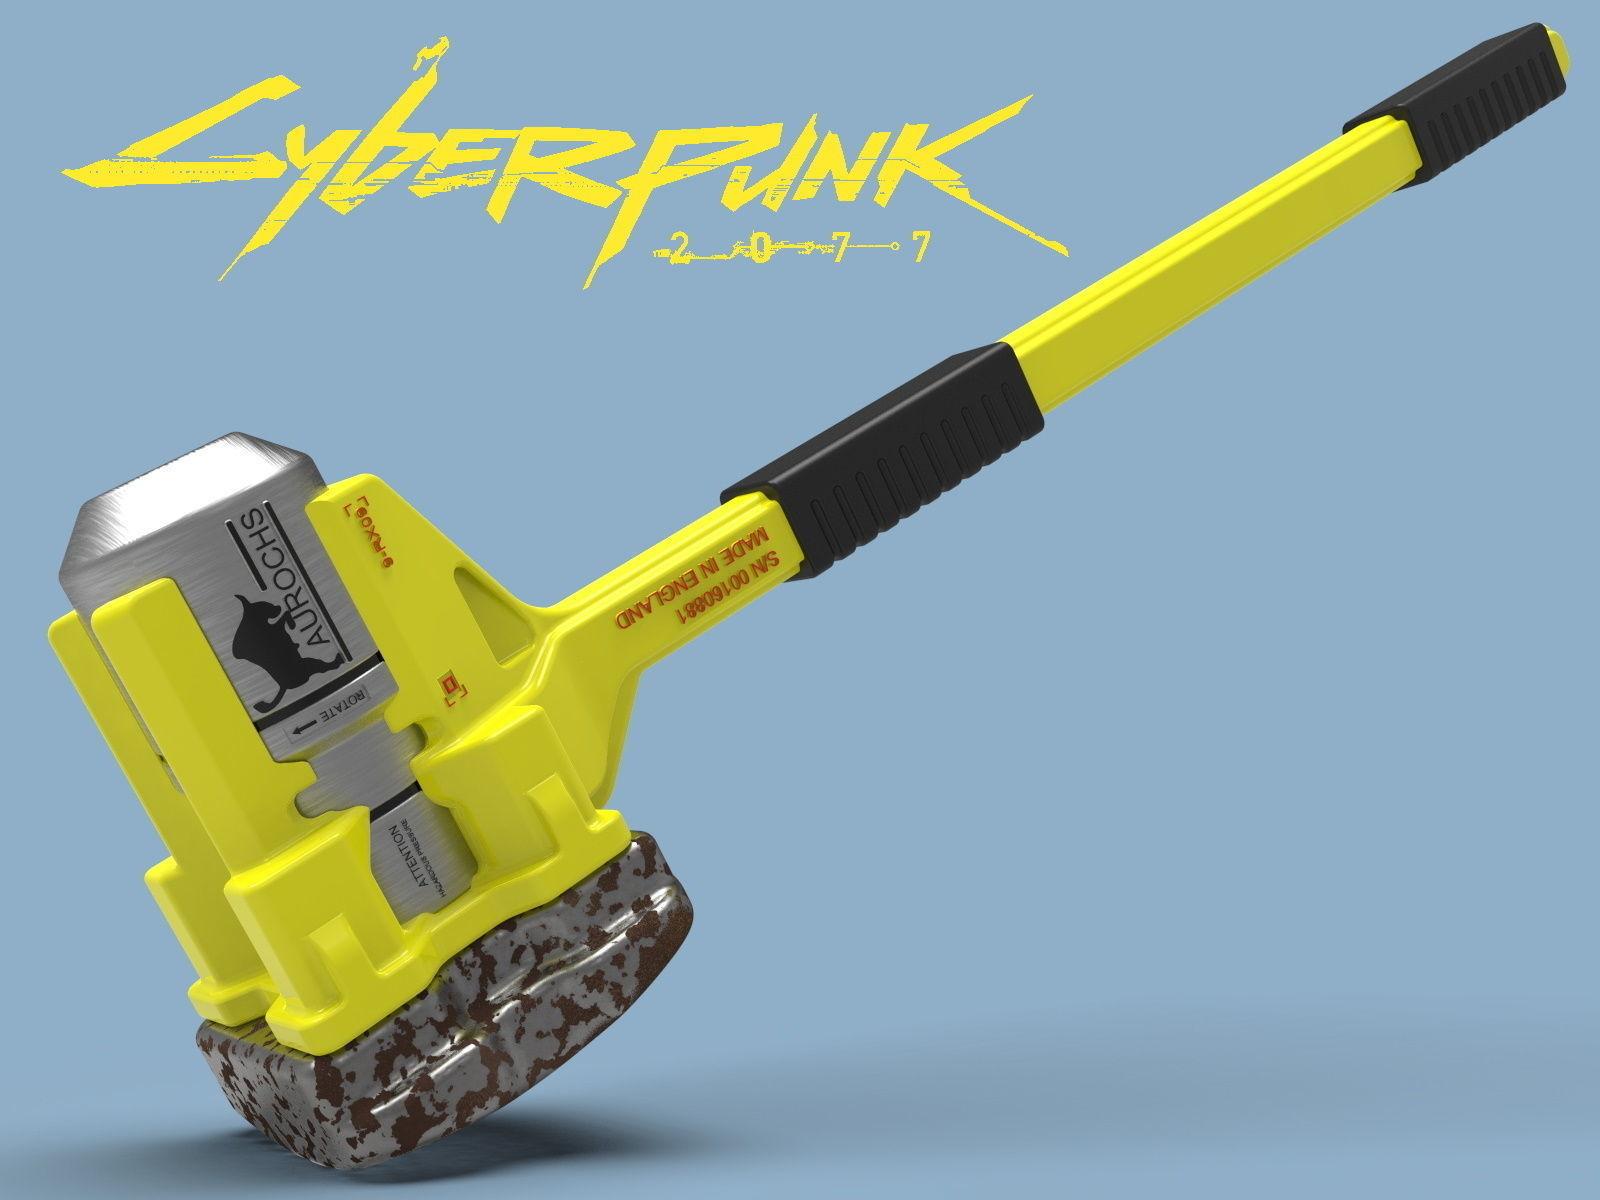 Cyberpunk Sasquatch Hammer 3d model for print